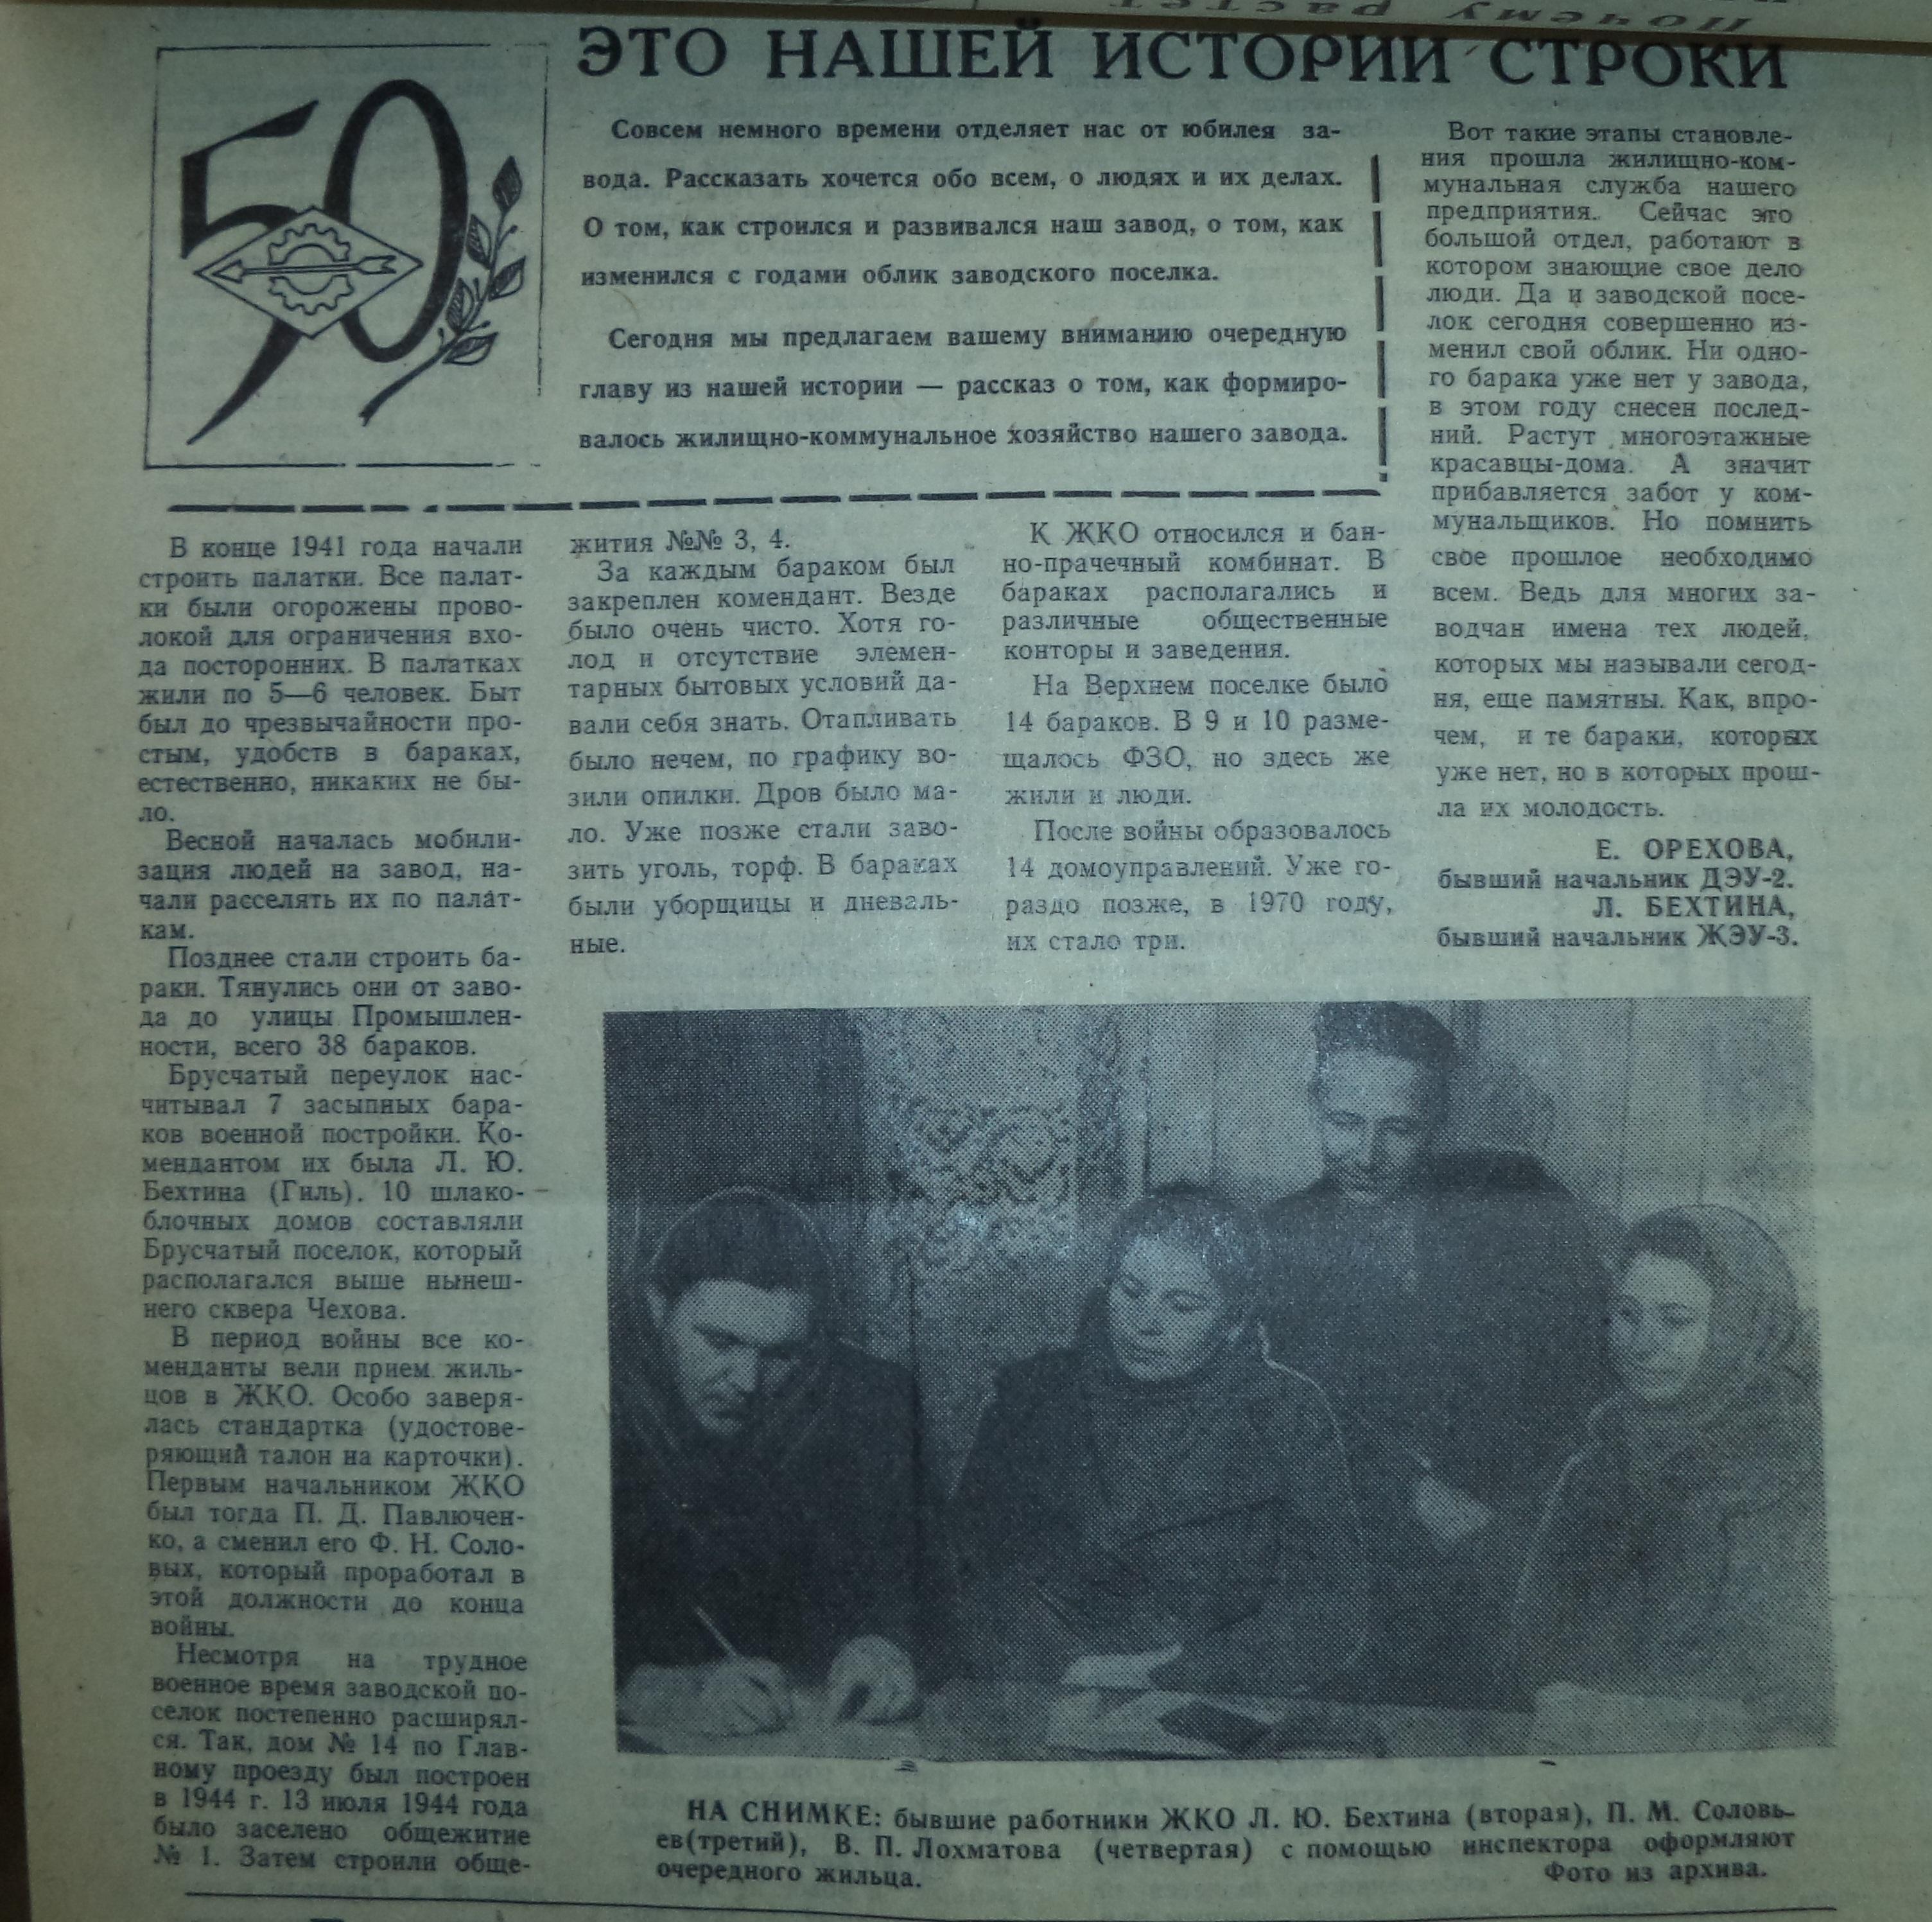 ФОТО-10-Брусчатый-За боевые темпы-1991-8 августа-2